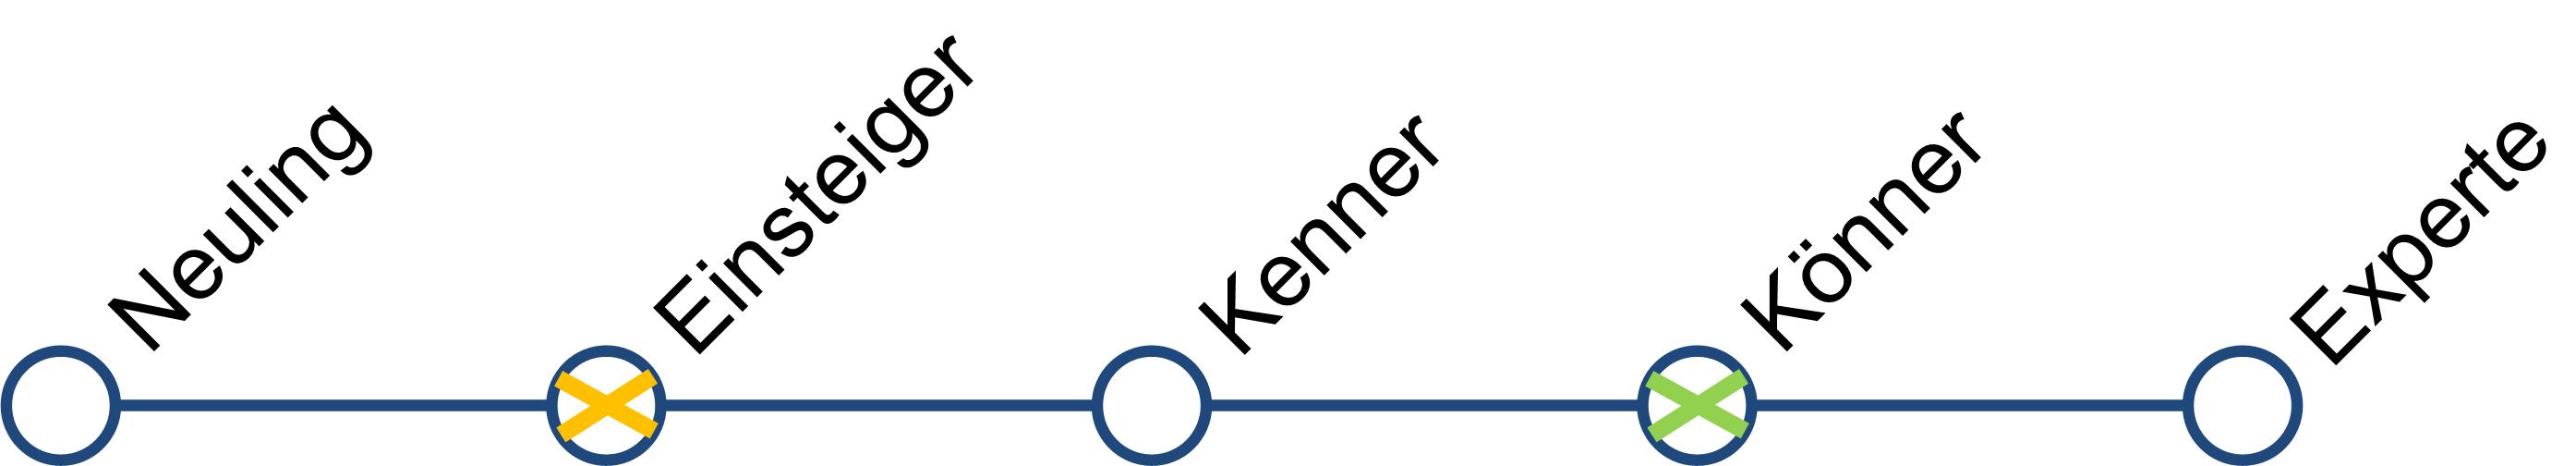 peco-all-kenntnis-klassifikation-linie